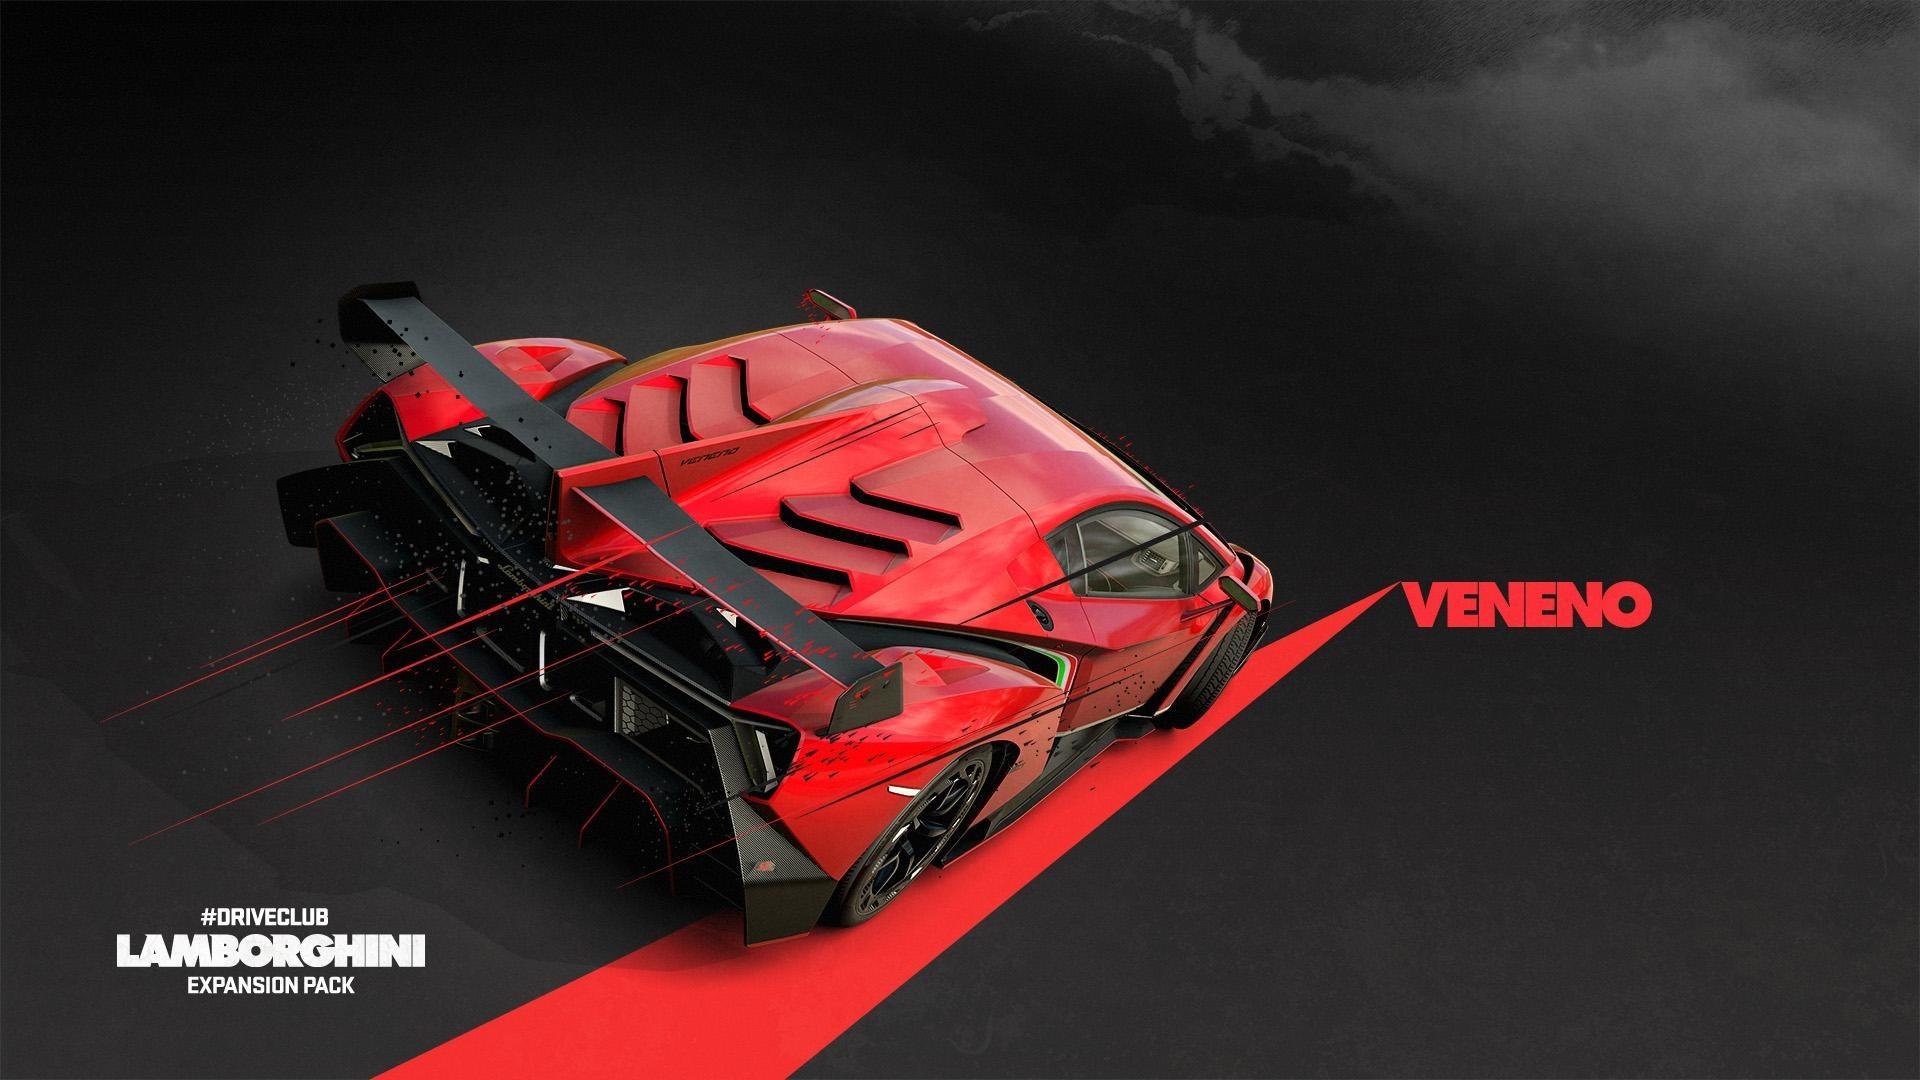 Lamborghini, Lamborghini Veneno, Driveclub, Video Games, Mid engine,  Italian Cars Wallpapers HD / Desktop and Mobile Backgrounds